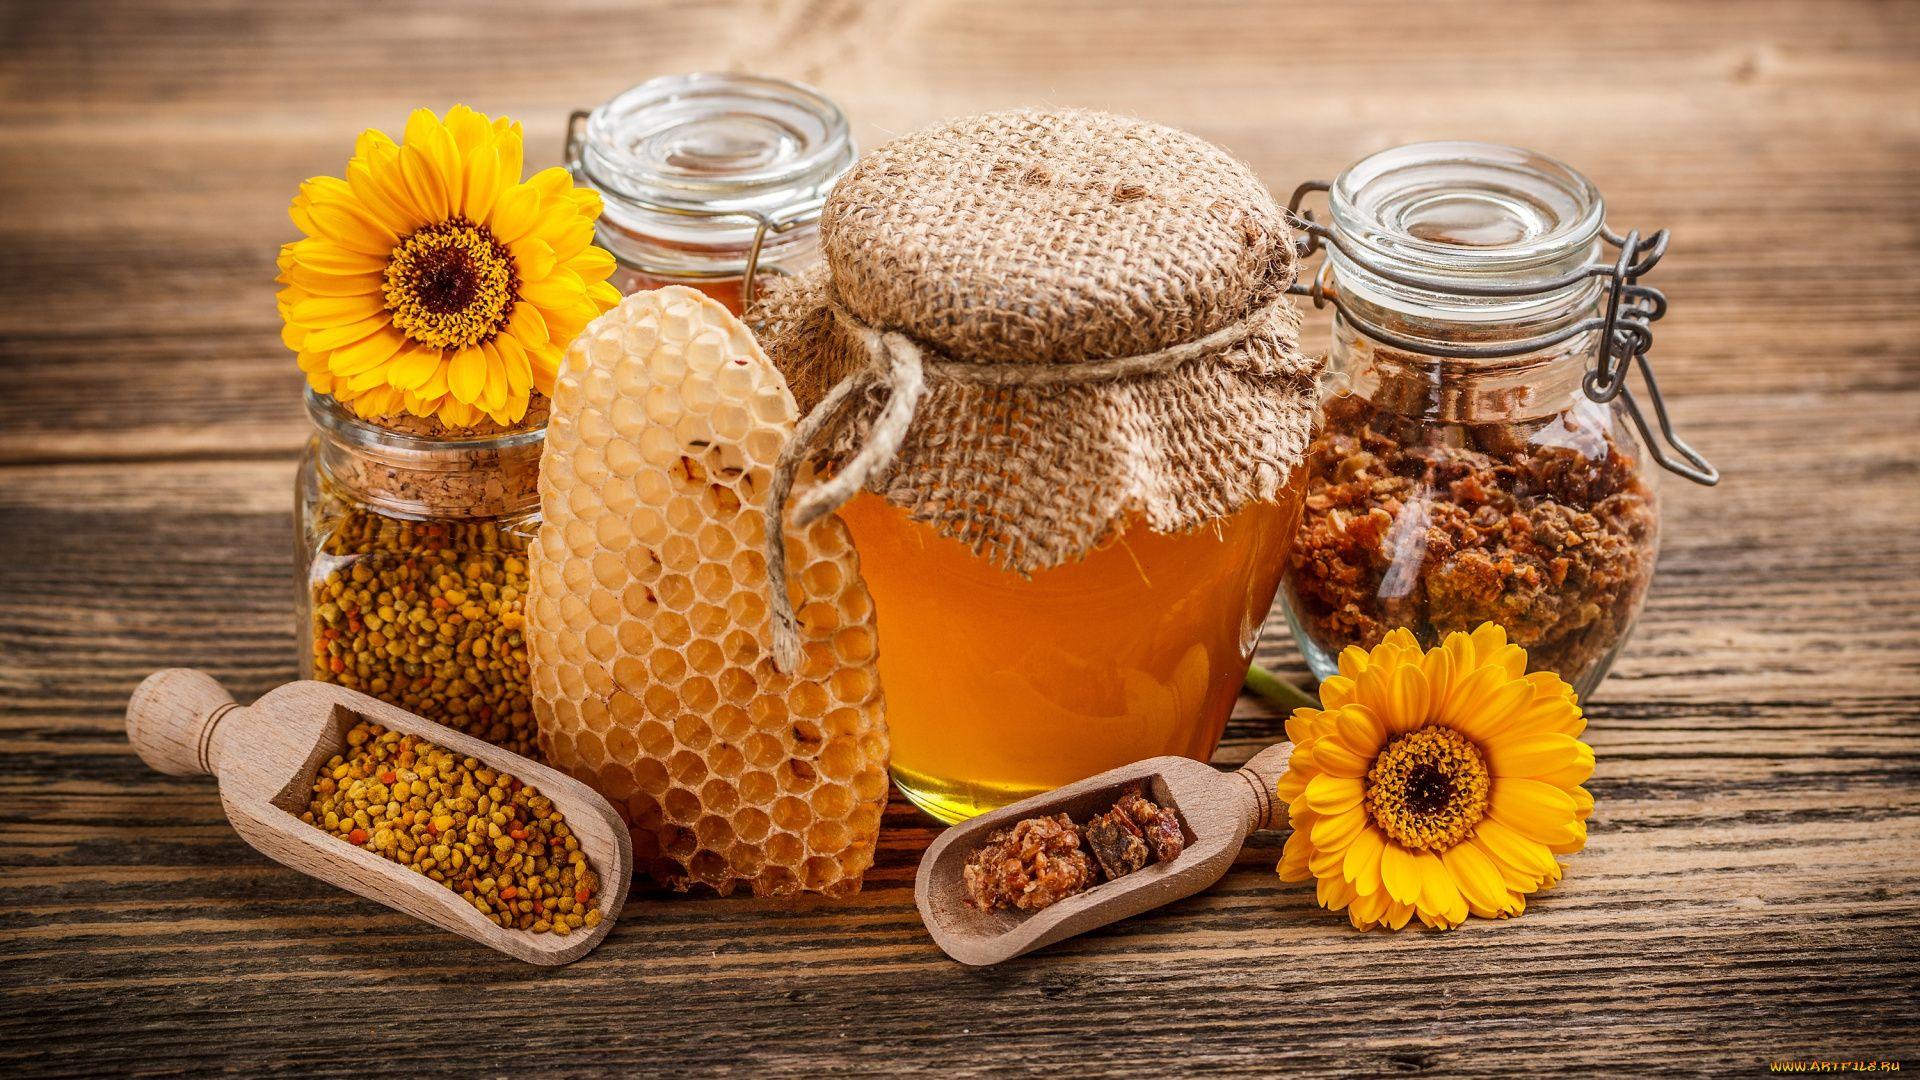 Honey 1080p Wallpaper